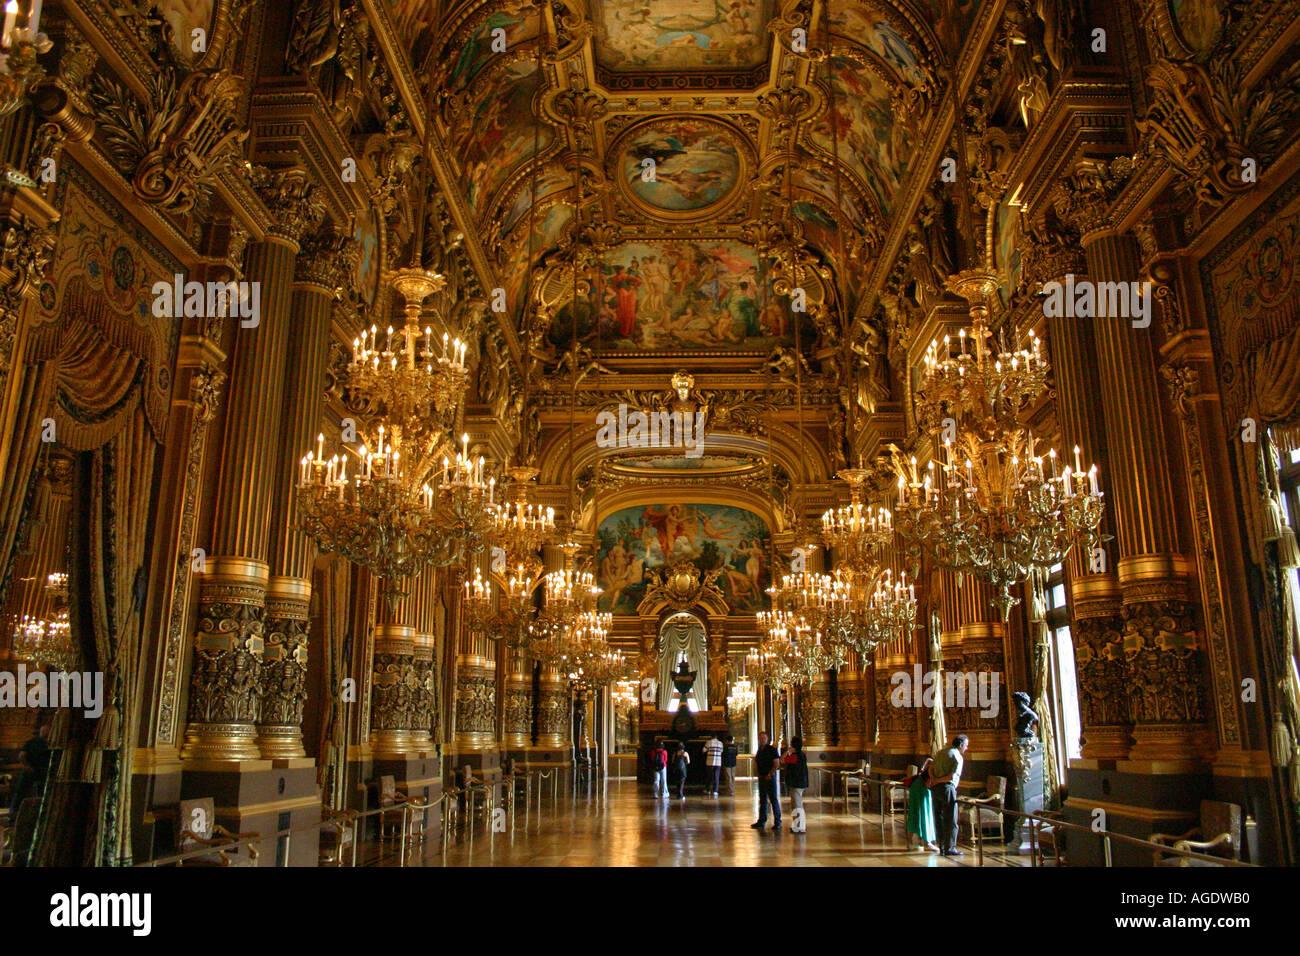 Opera Garnier Paris - Stock Image